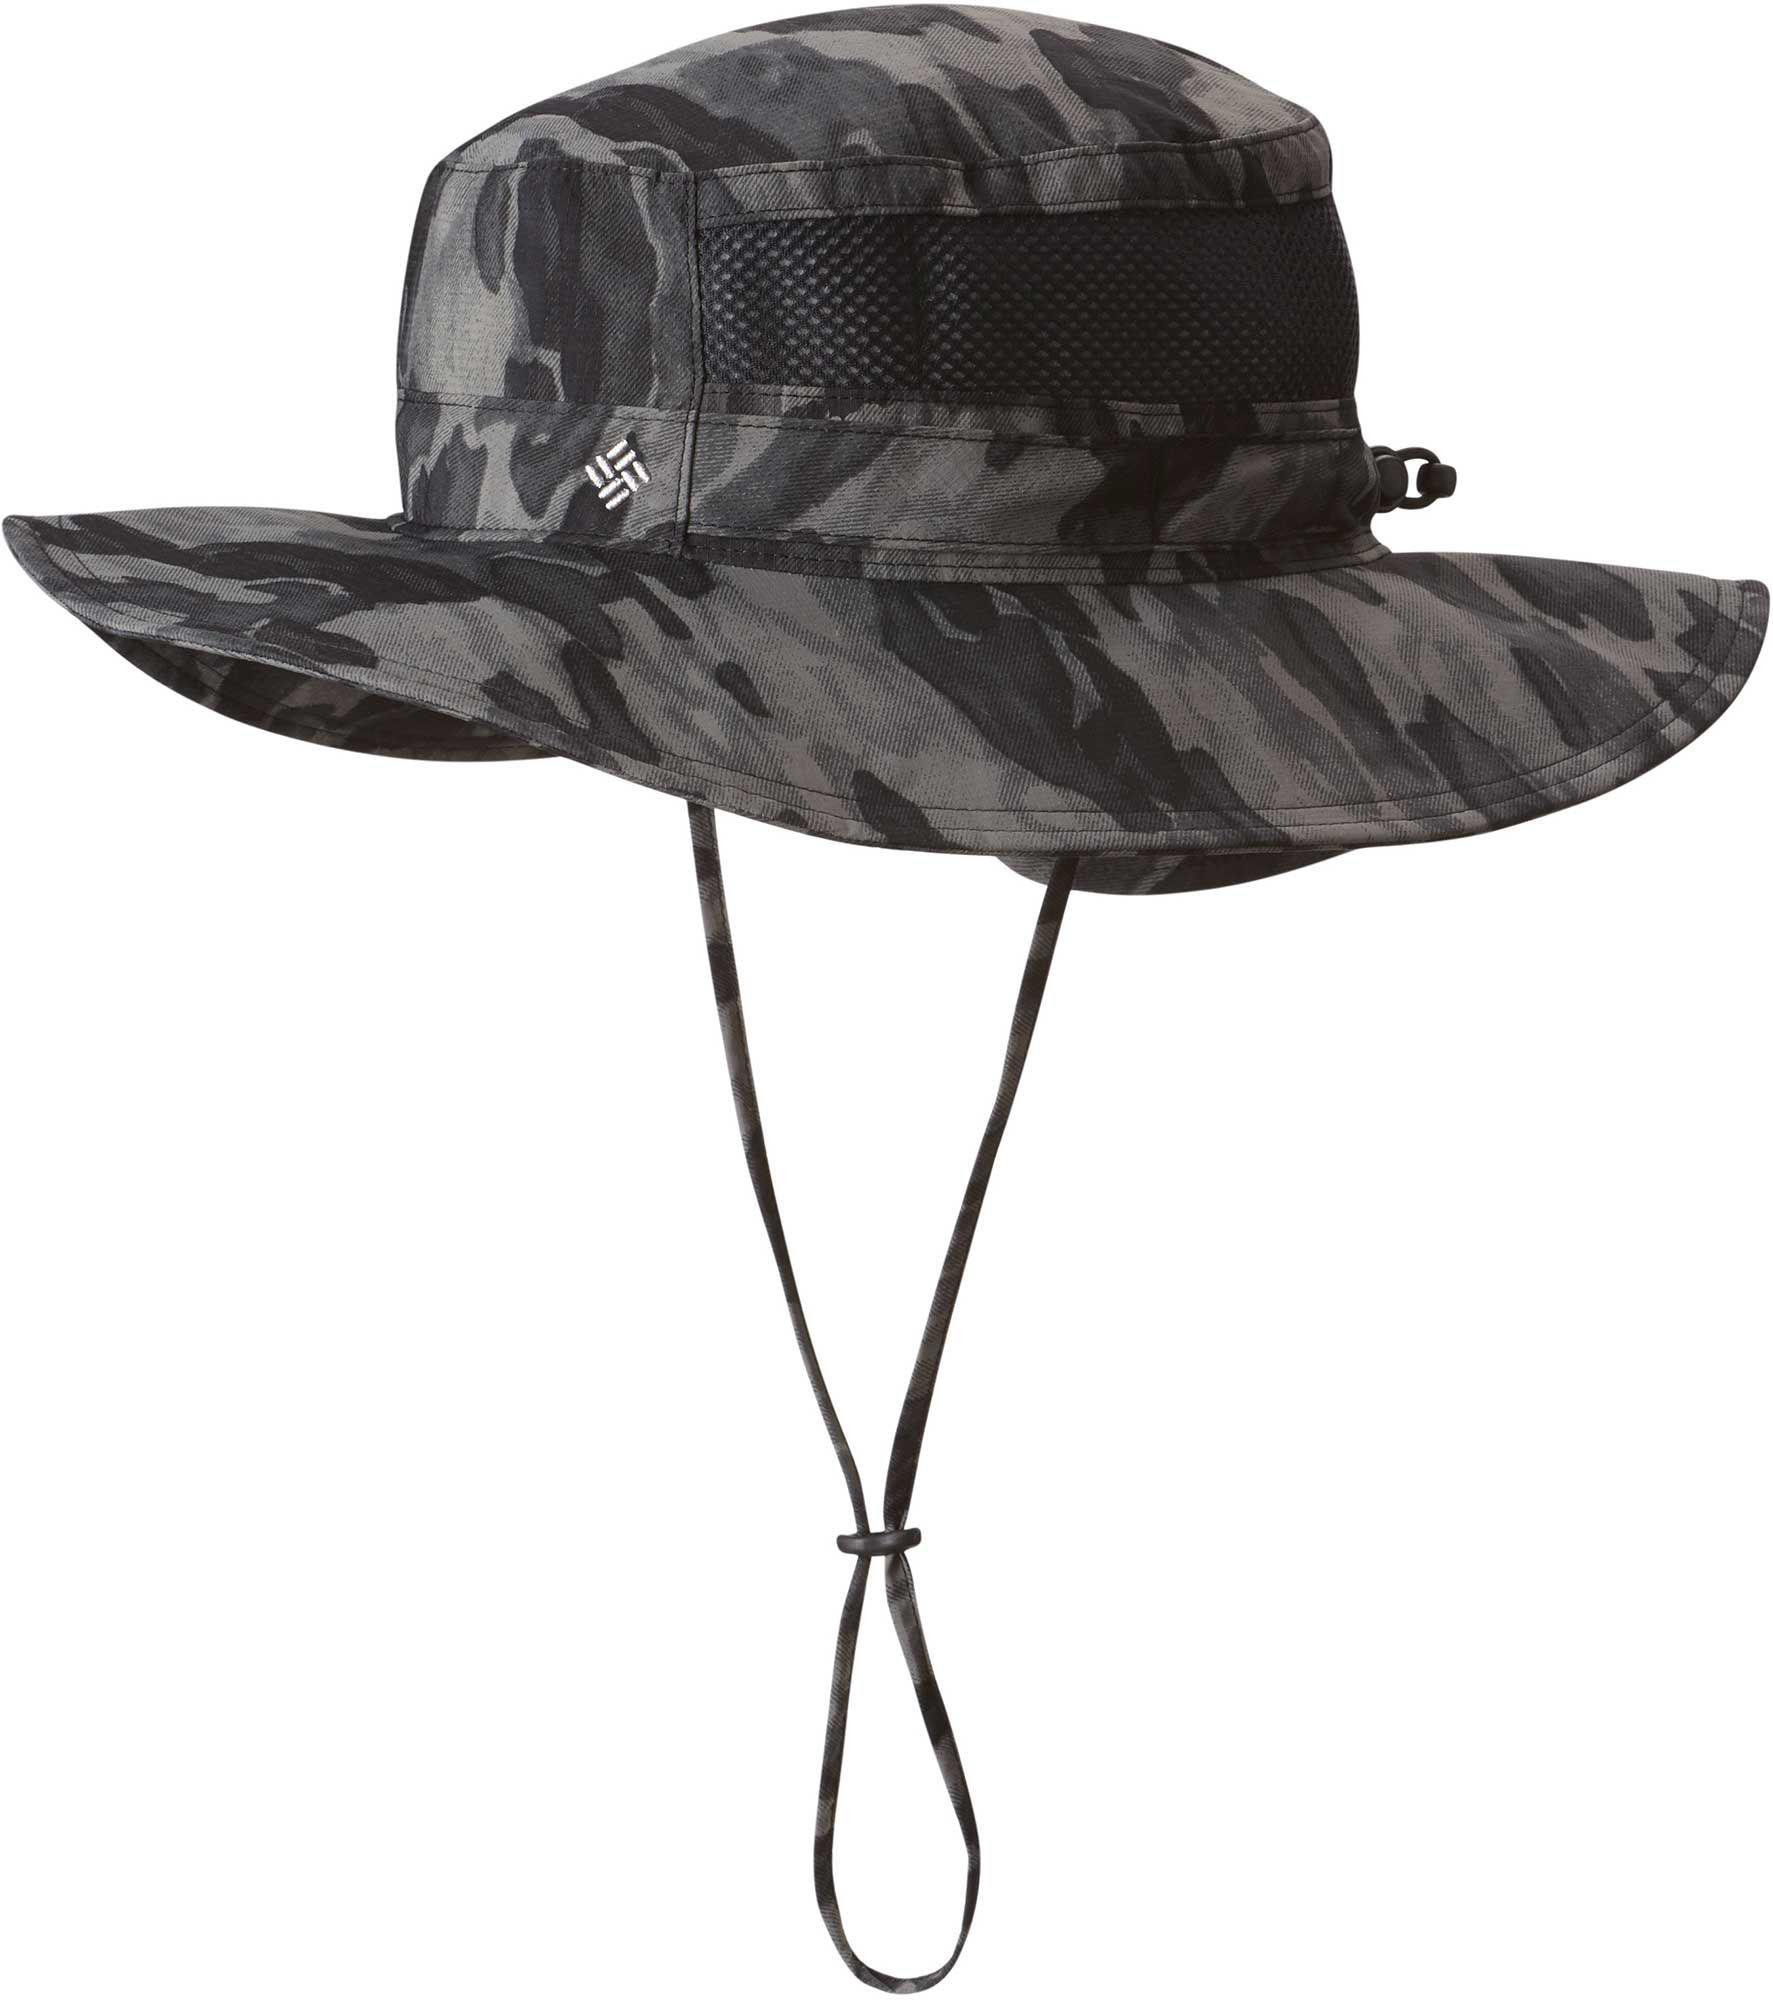 Lyst - Columbia Ora Bora Print Booney Hat in Black for Men 72ebc2e4ad41